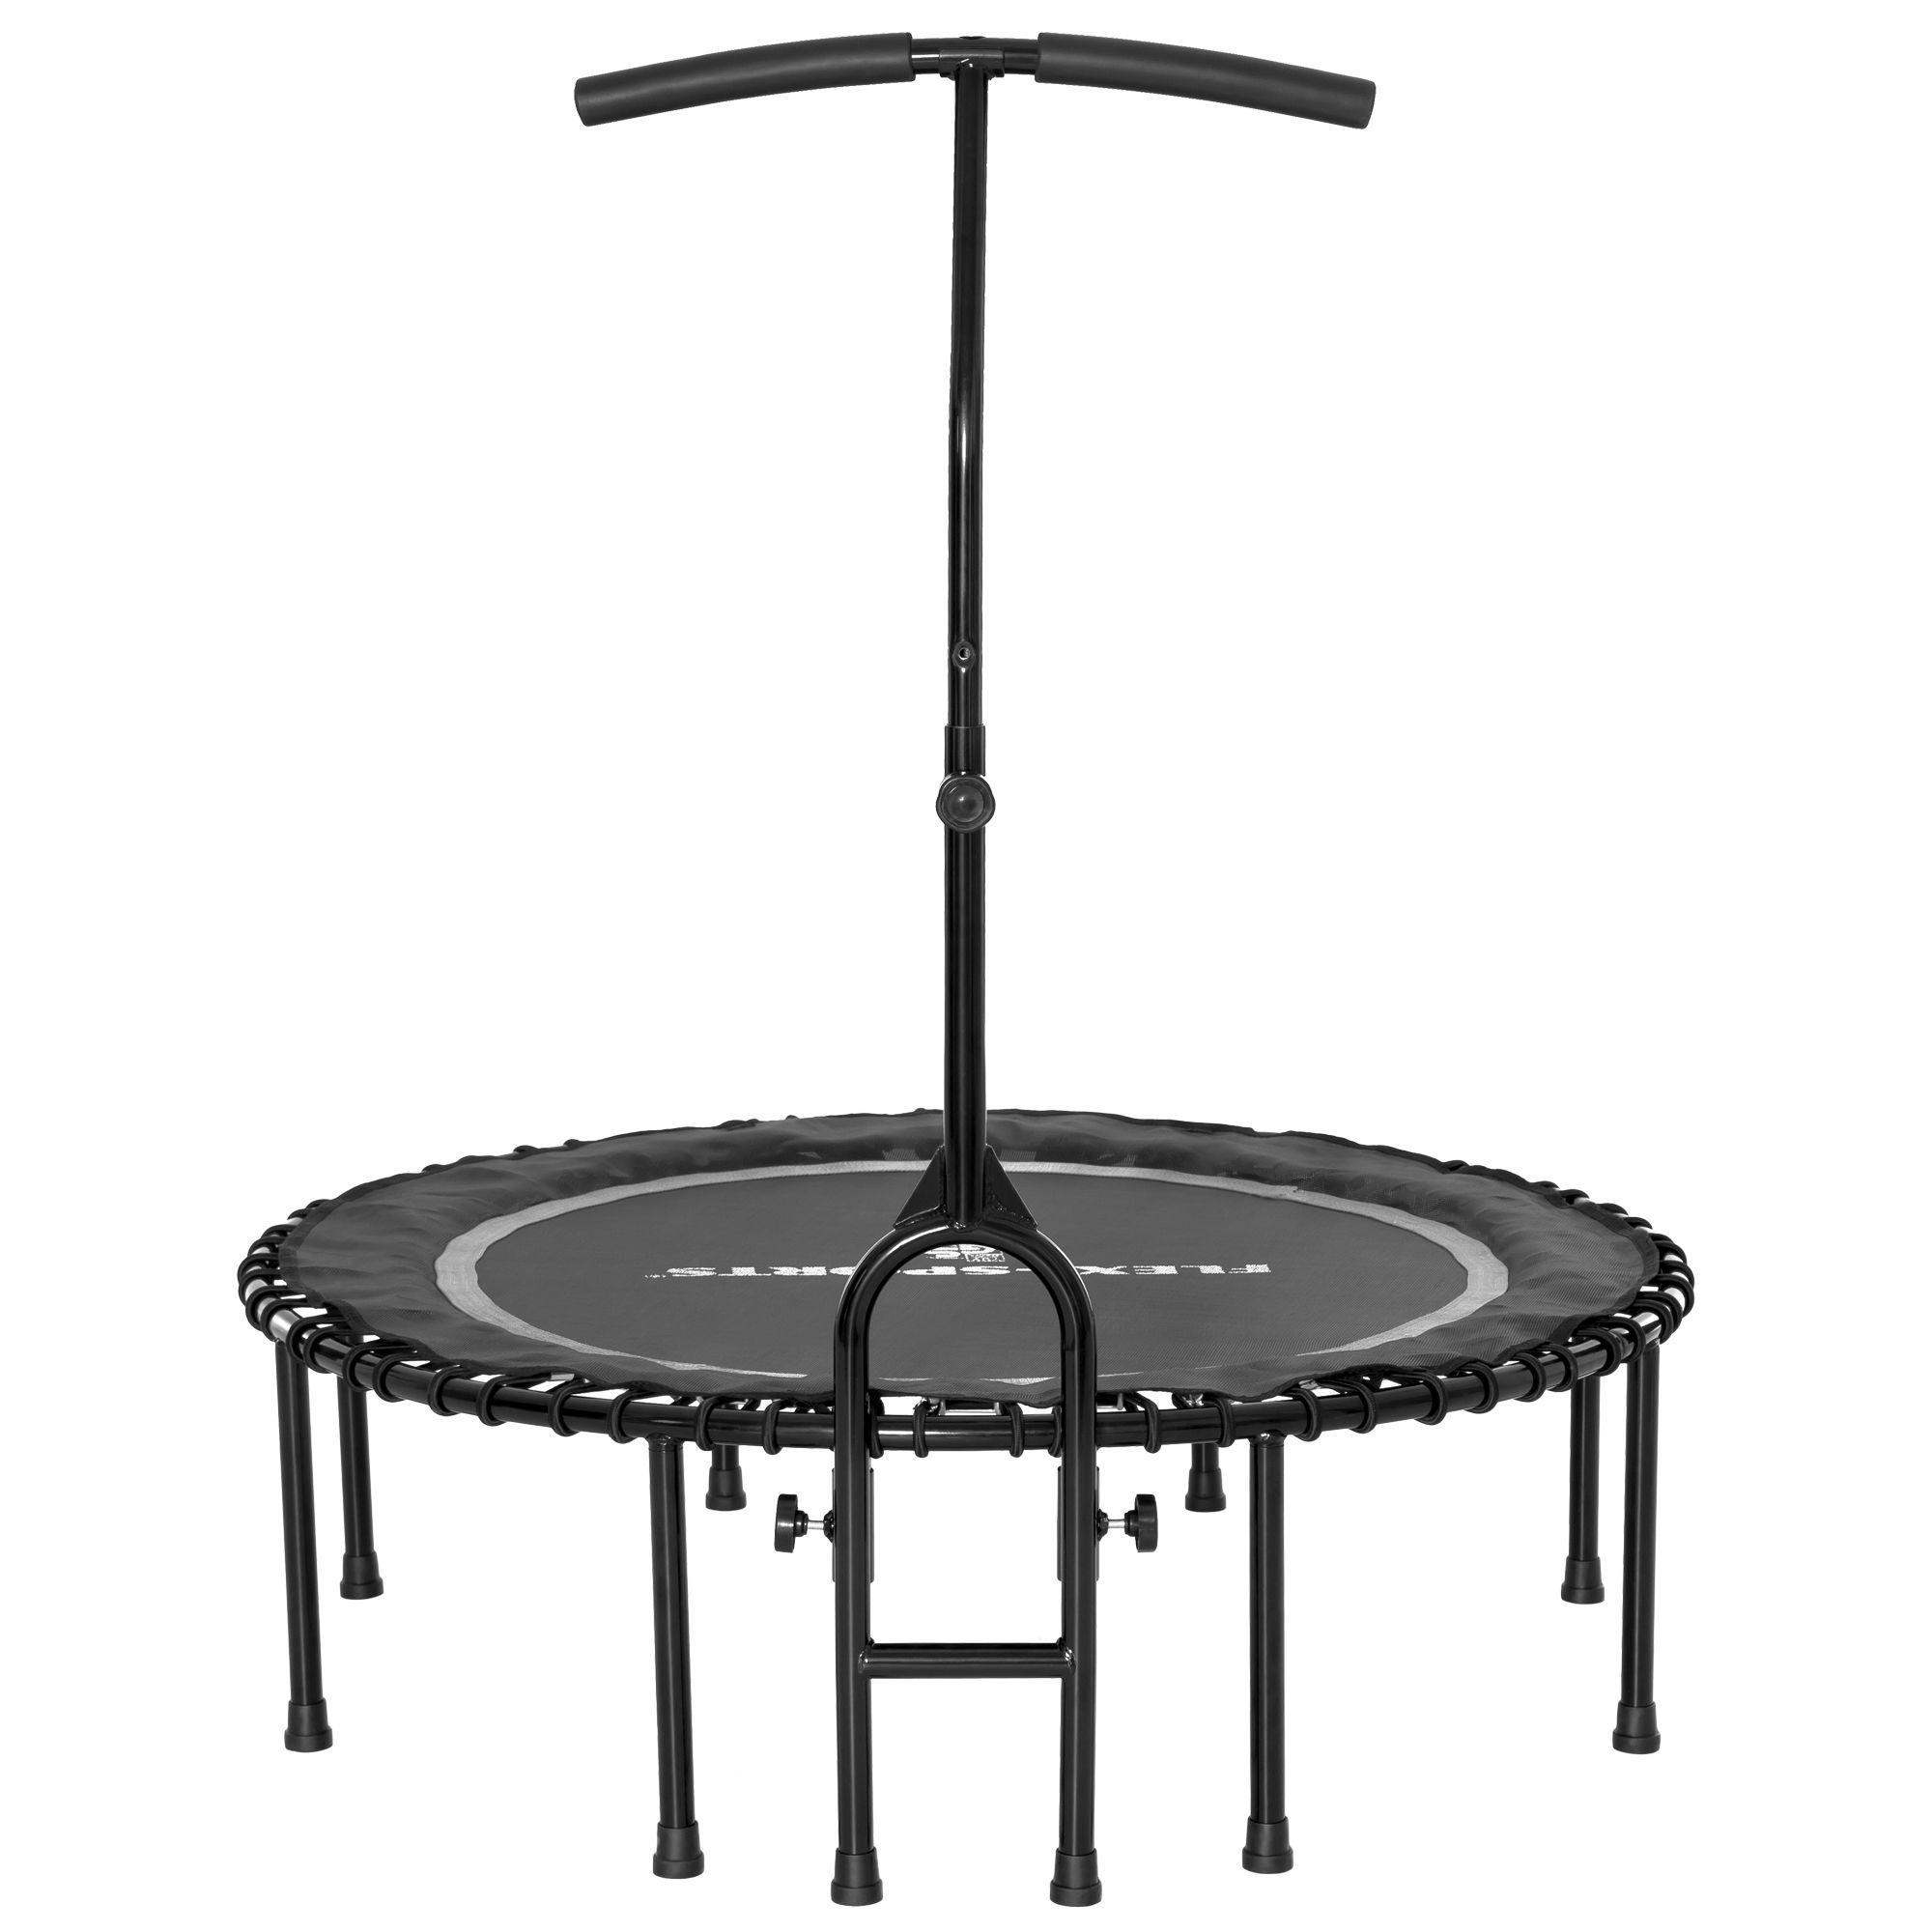 Qvc Sportgeräte flexi-sports fitness-trampolin Ø 115cm inkl. haltestange & neuer